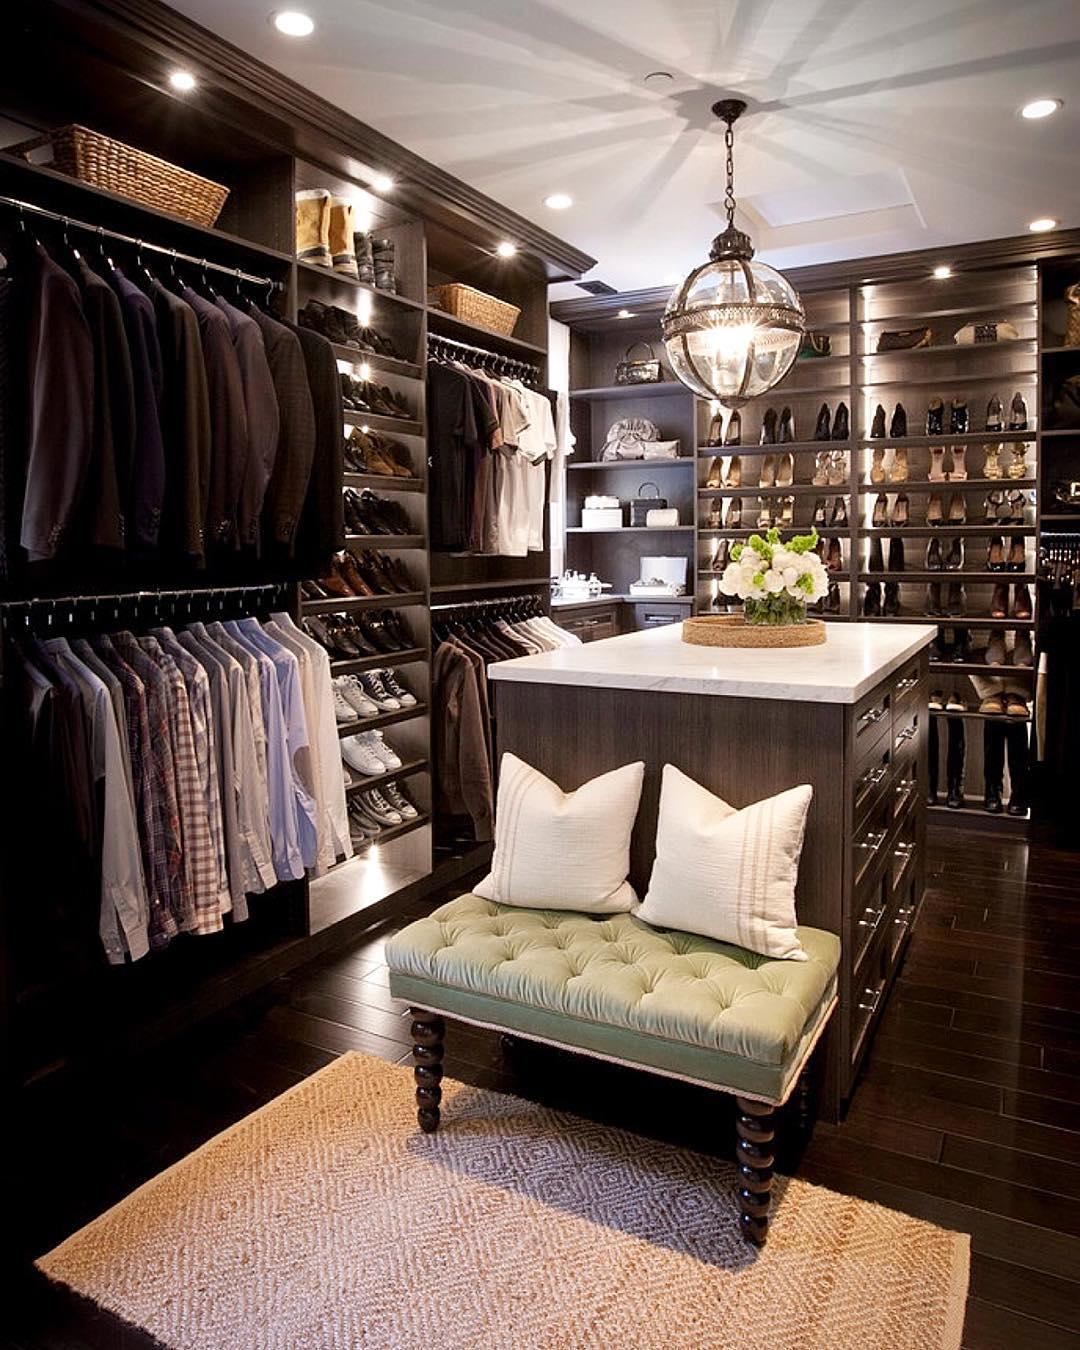 Picture Of Dream Closet Design In Moody Colors